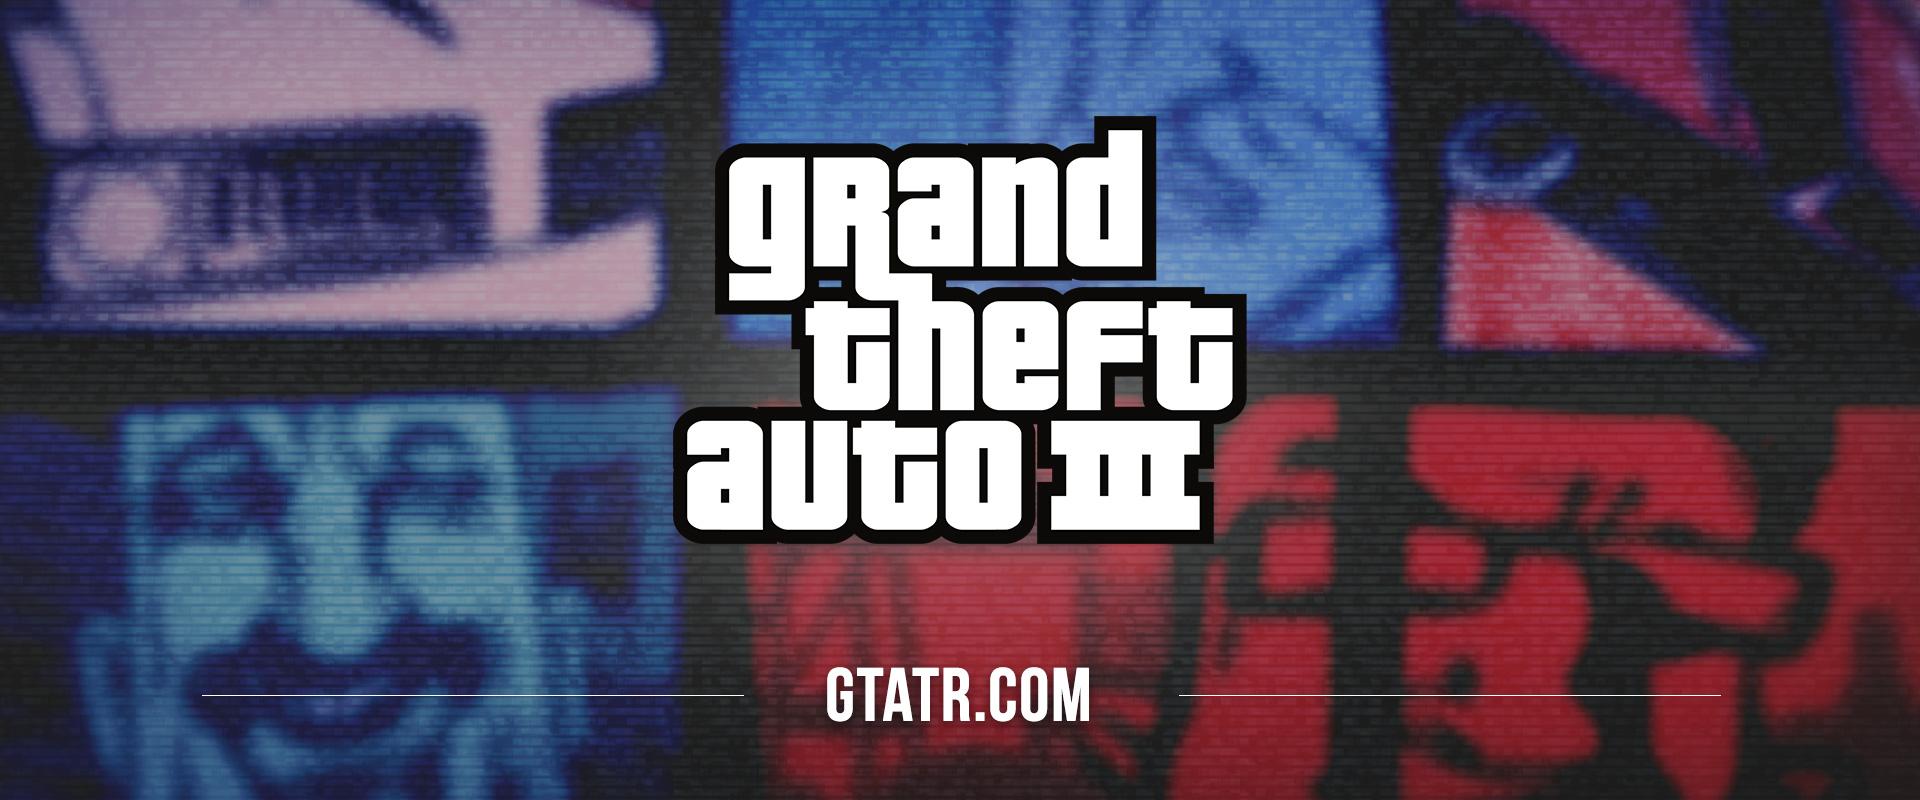 GTA III Banner